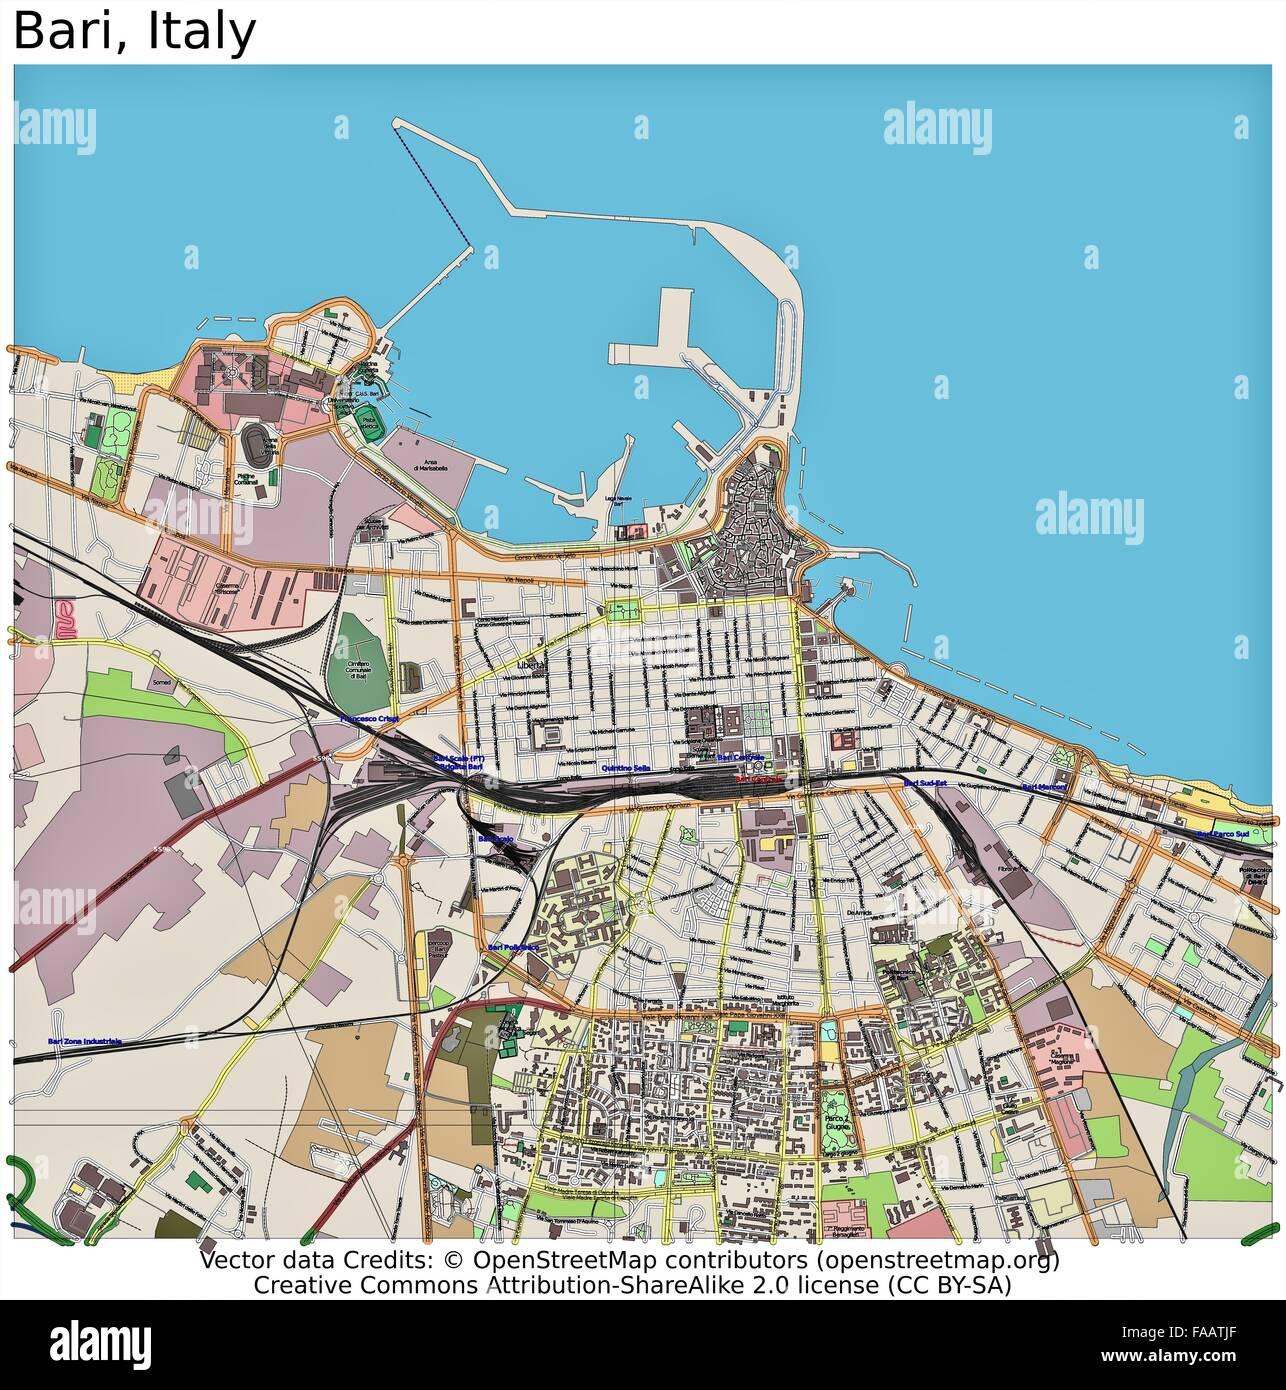 Bari Italy City Map Stock Photo Royalty Free Image Alamy - Bari map